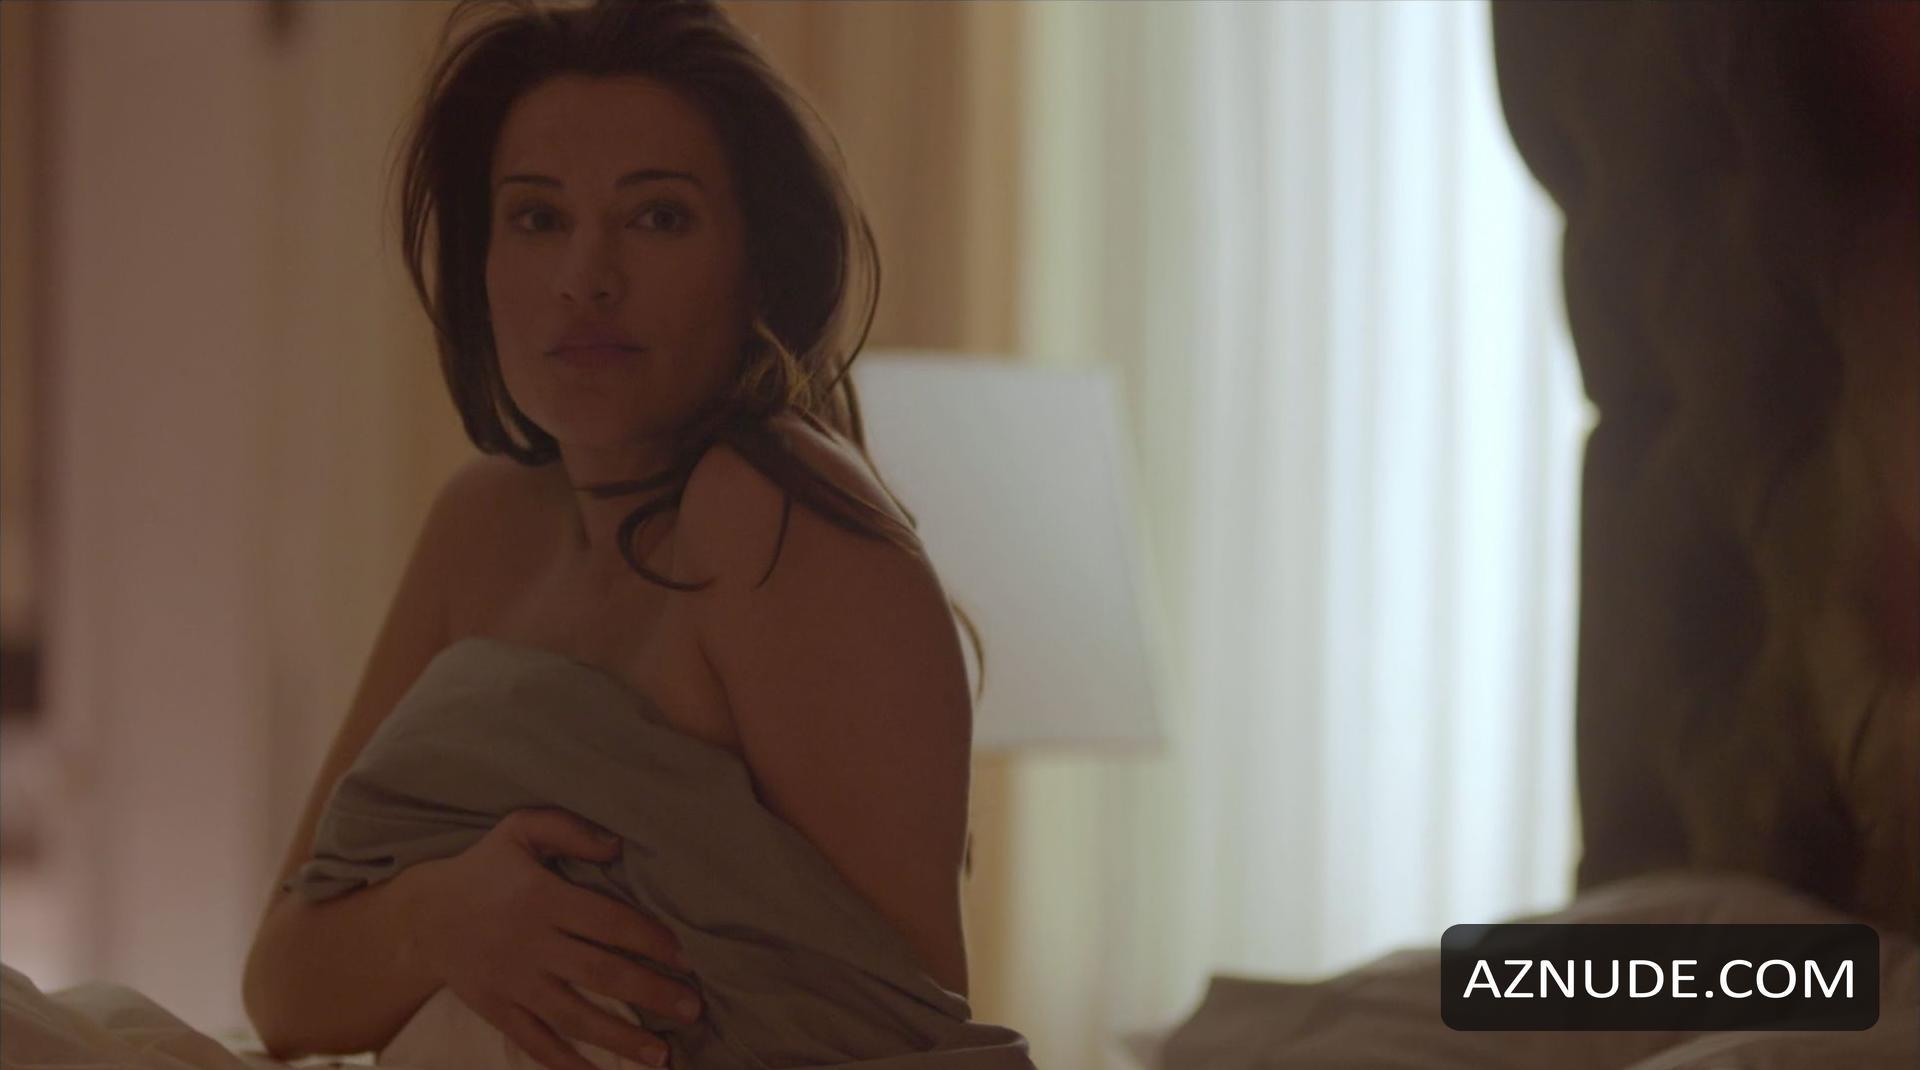 America Olivo Desnuda the strain nude scenes - aznude